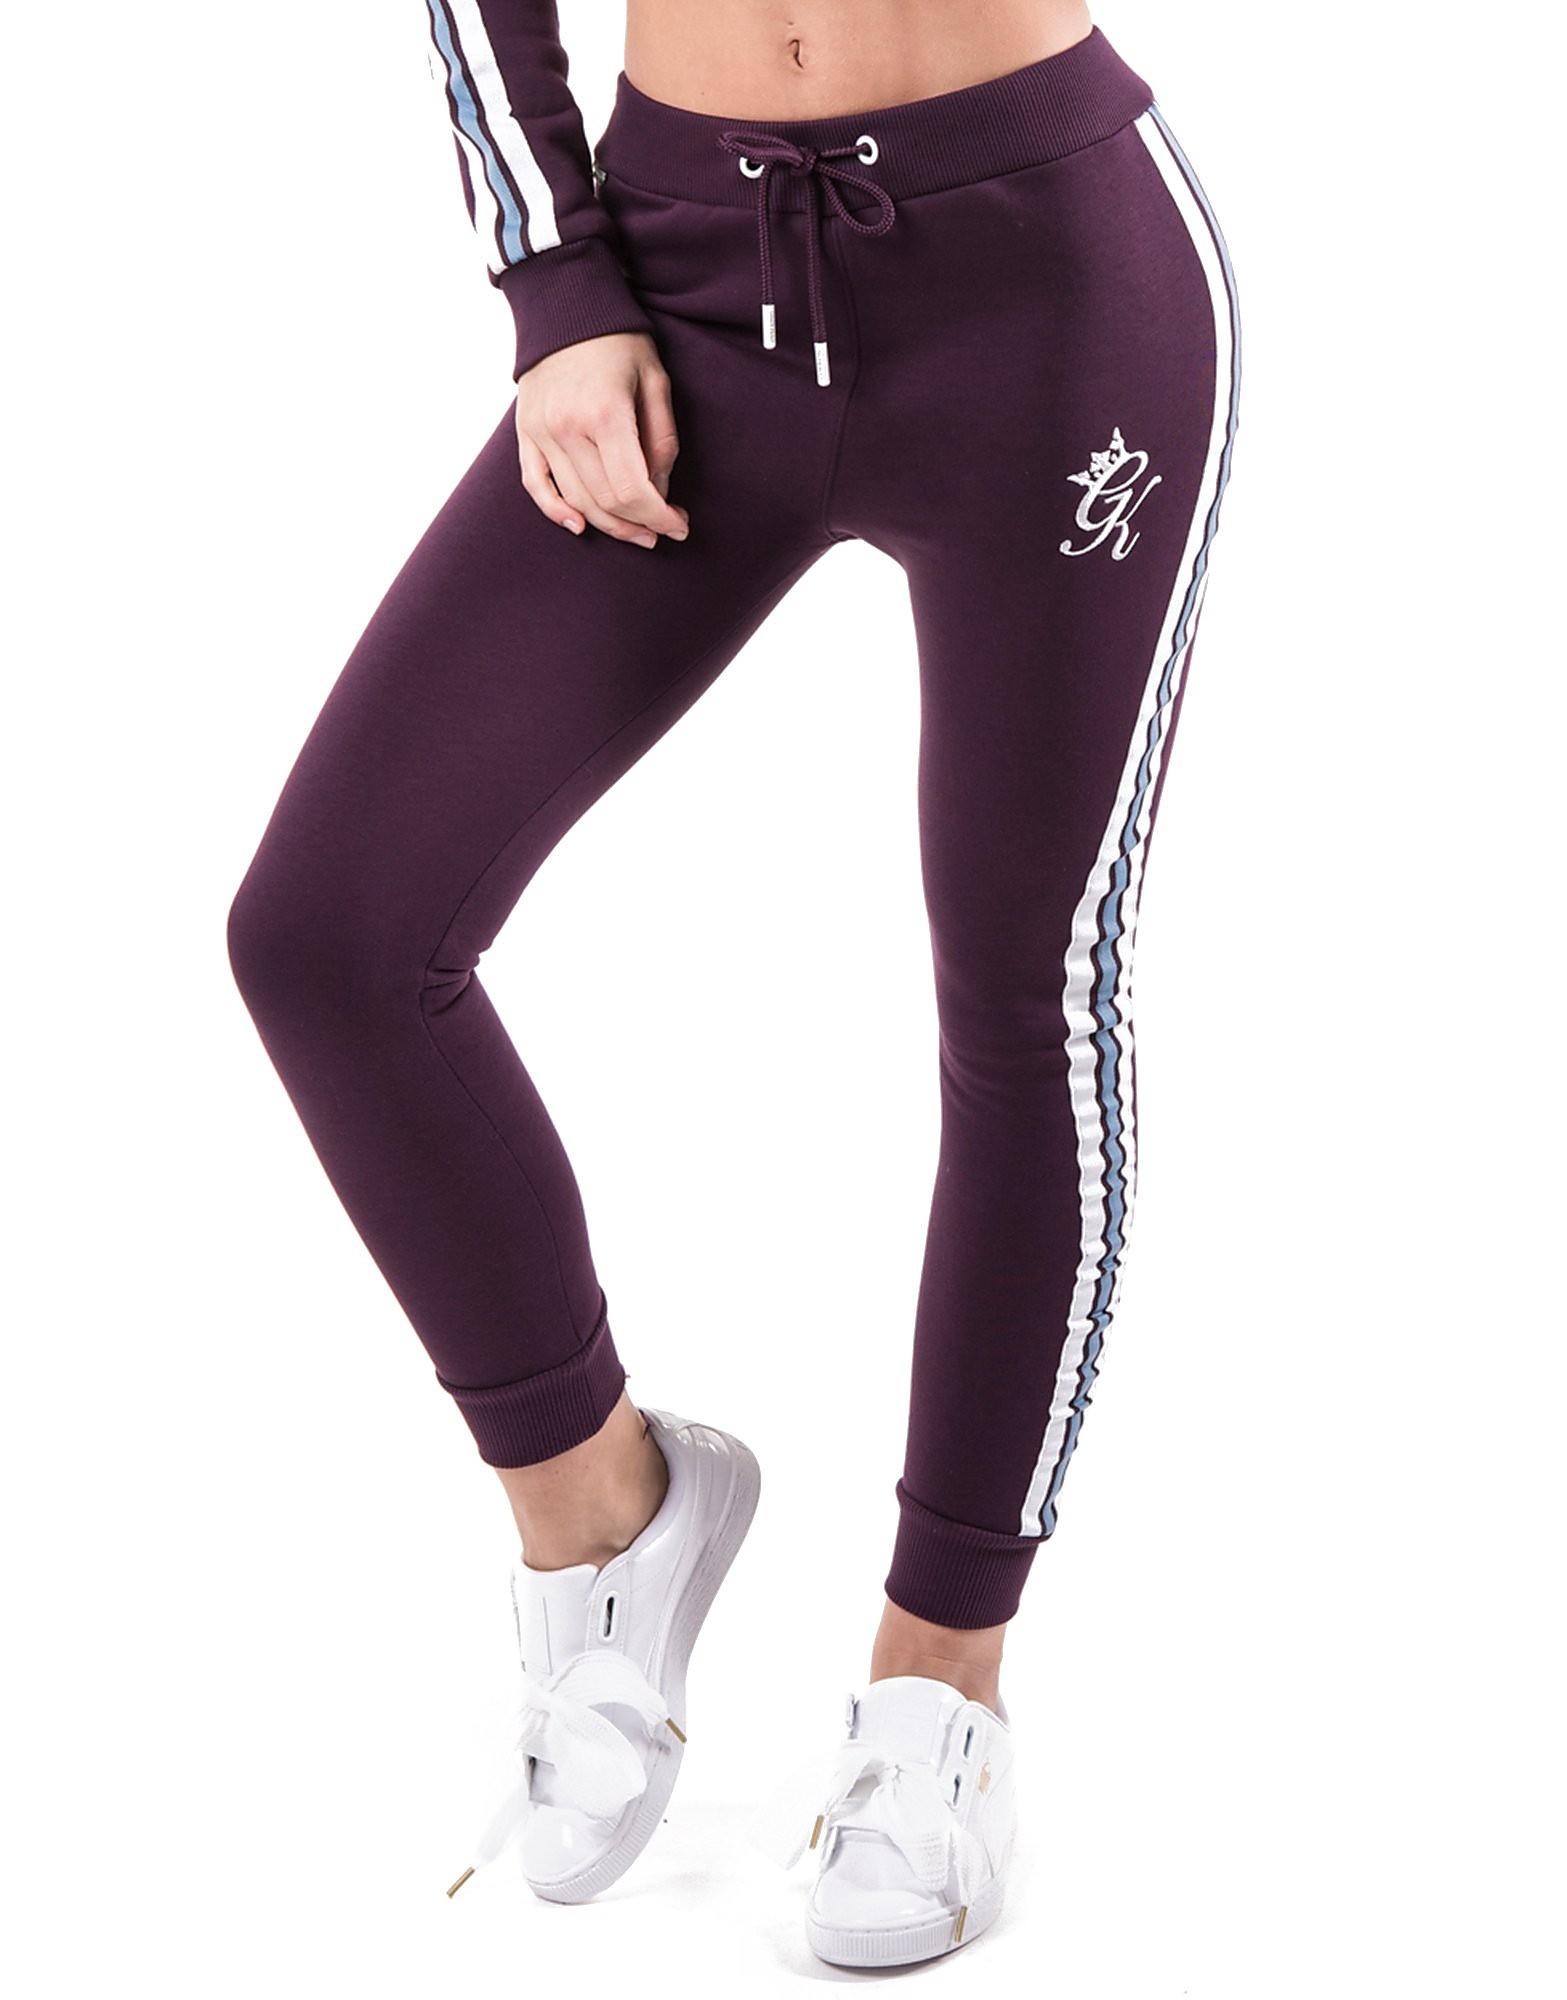 Gym King Panel Fleece Pants